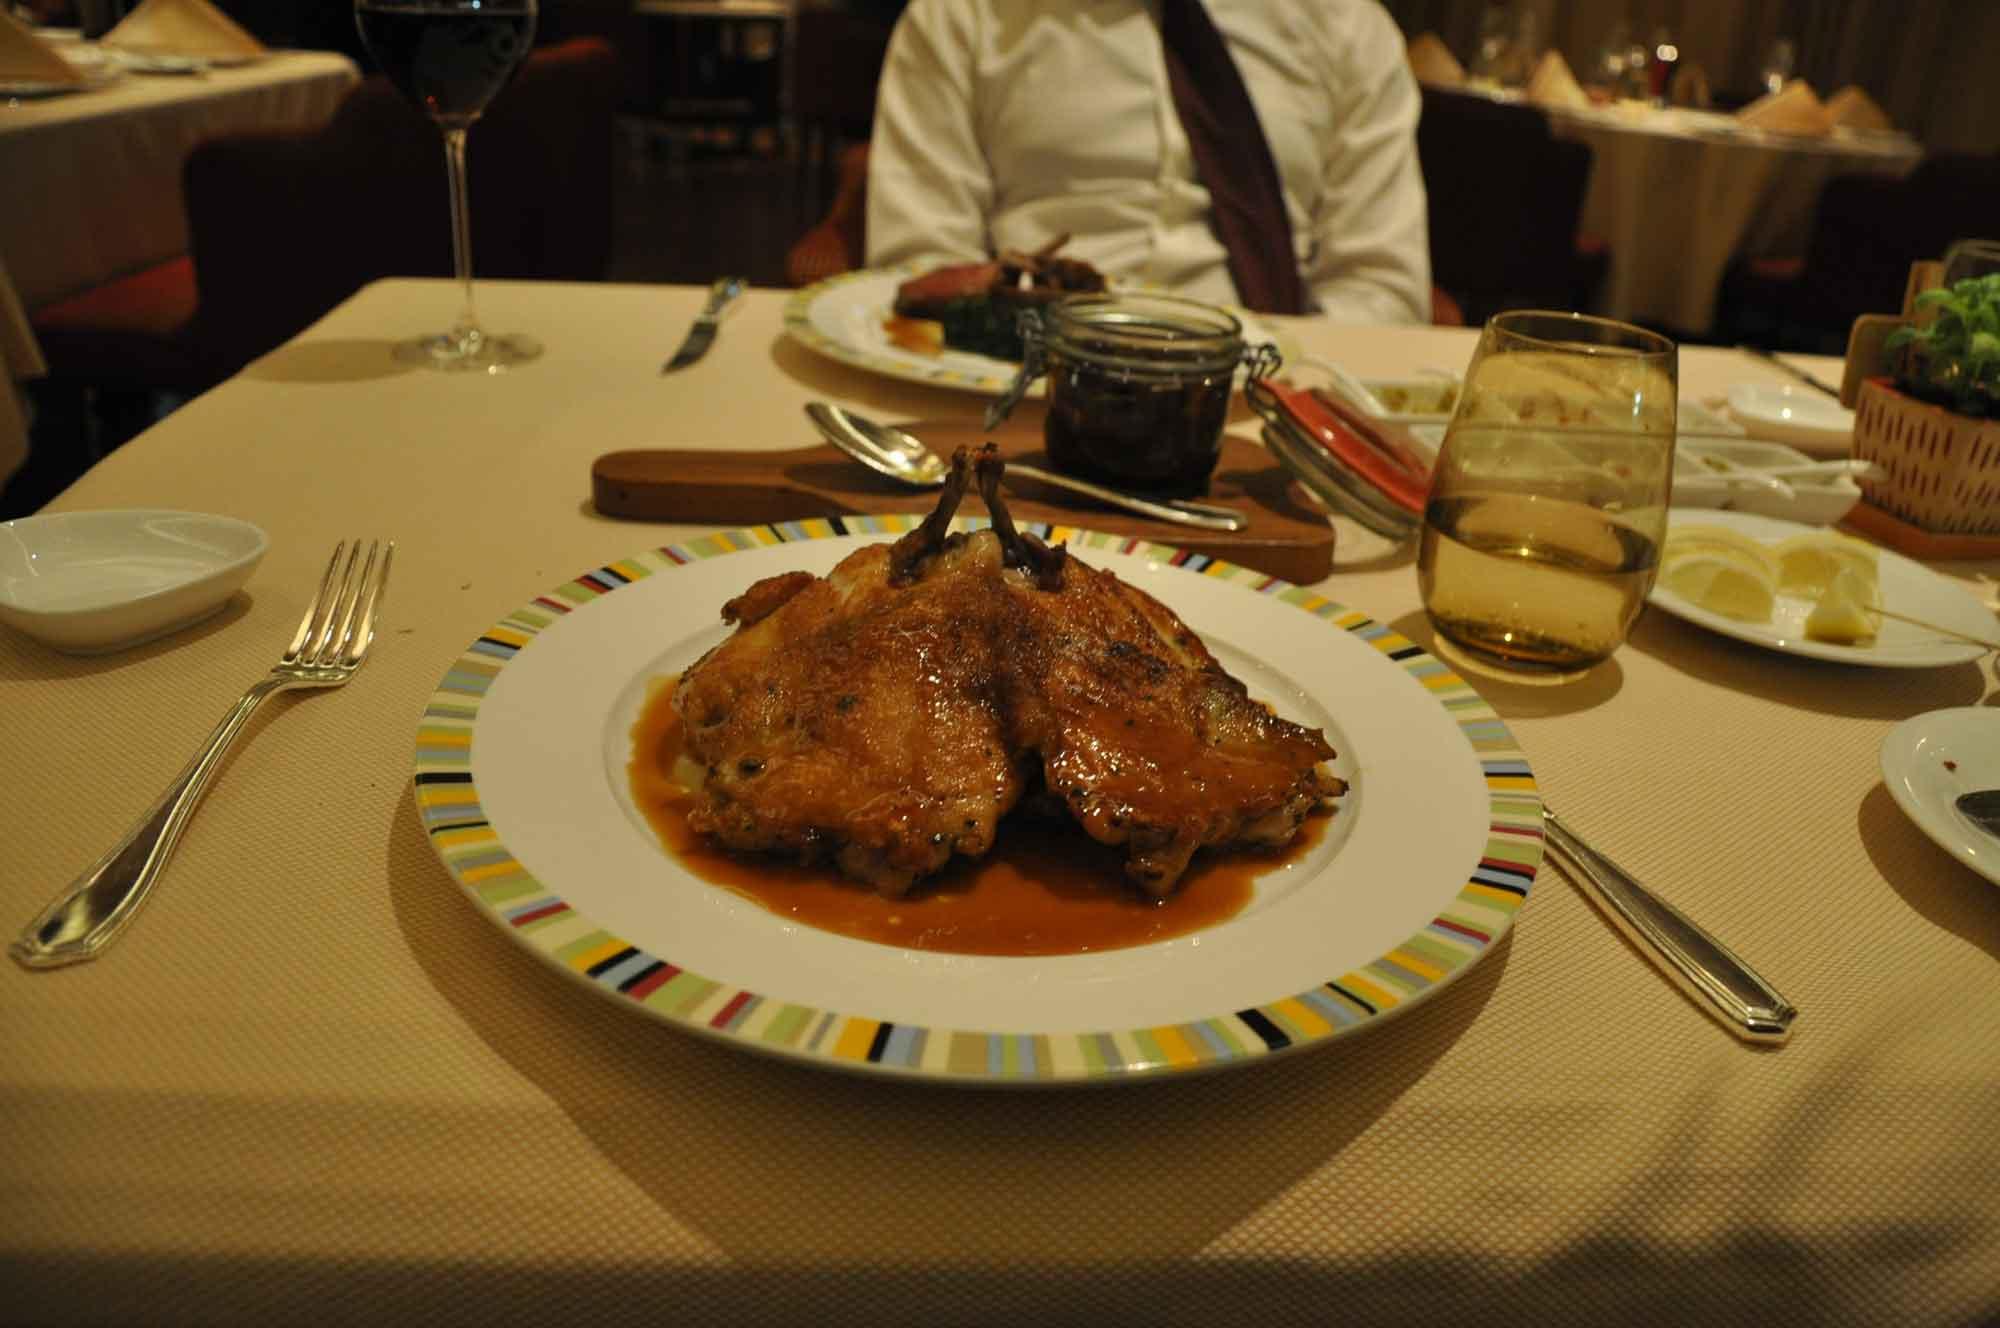 Terrazza Macau chicken